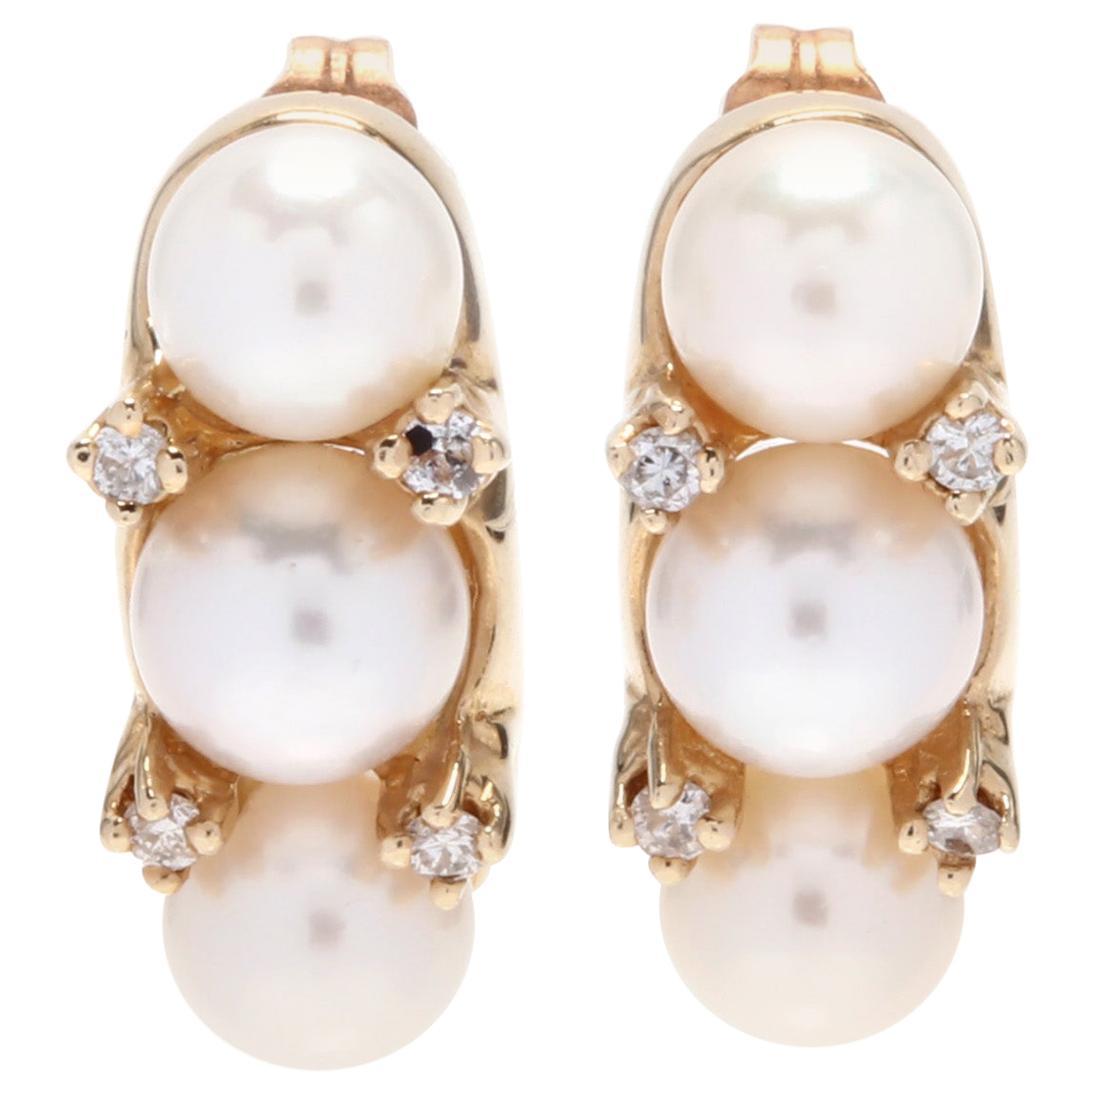 14 Karat Yellow Gold, Diamond and Pearl Earrings